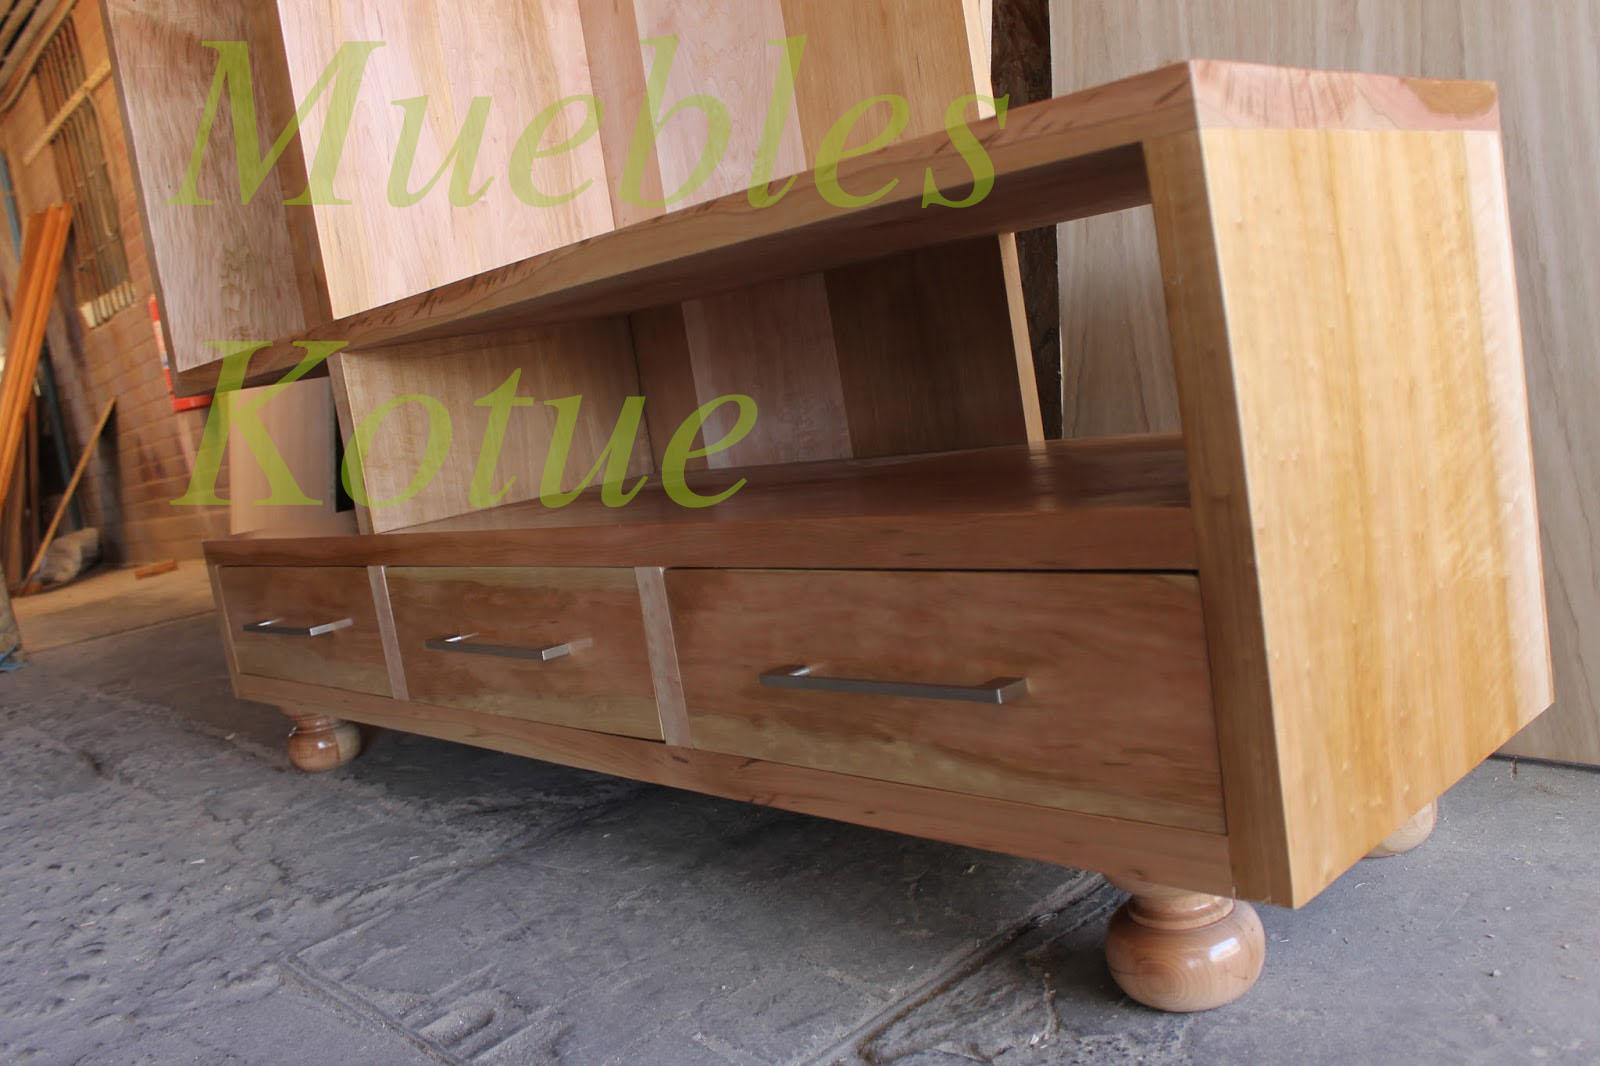 Muebles kotue mueble repisa - Mueble de pino ...